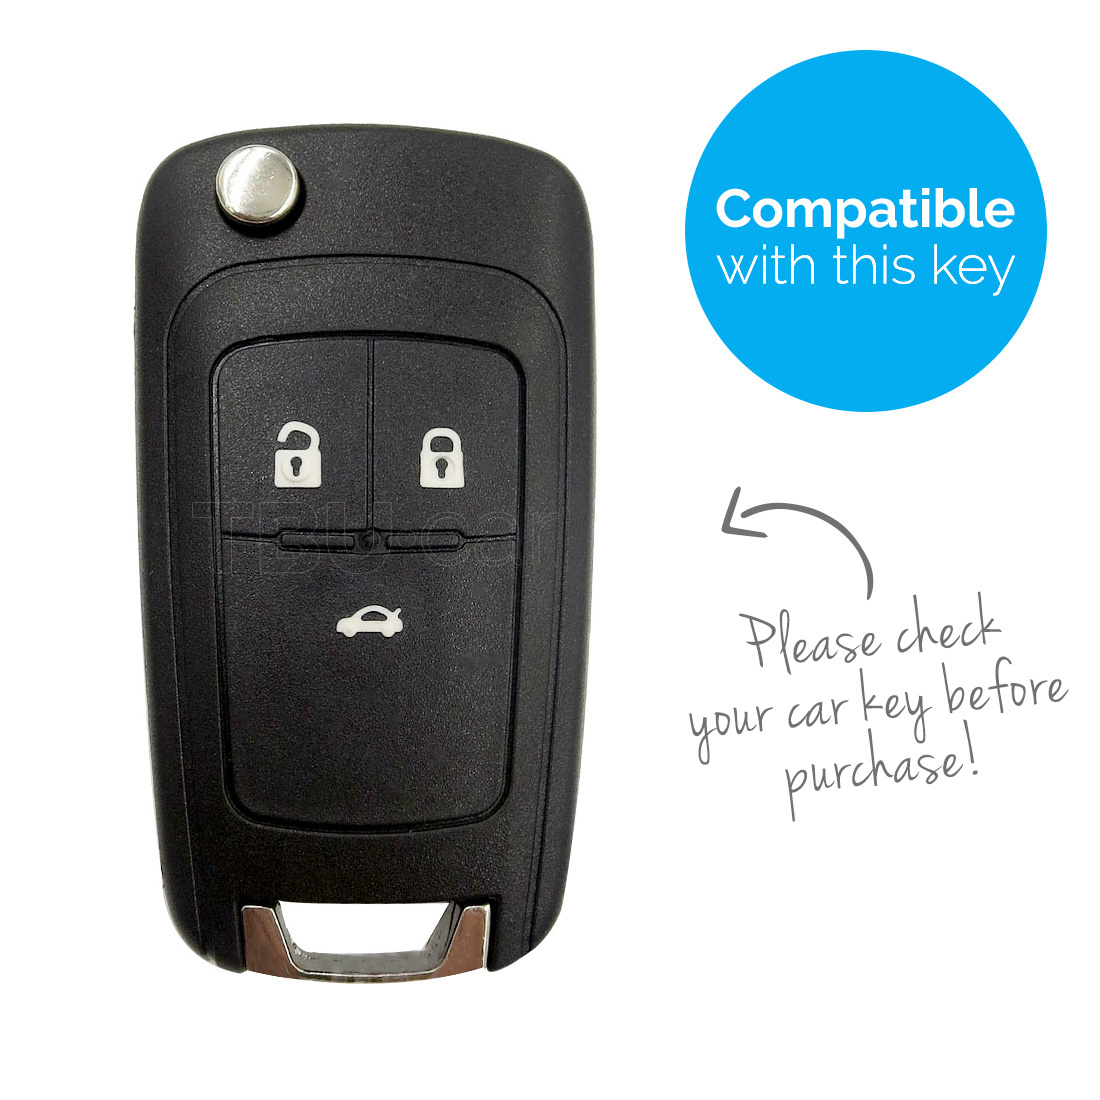 TBU car Autoschlüssel Hülle für Vauxhall 3 Tasten - Schutzhülle aus Silikon - Auto Schlüsselhülle Cover in Blau